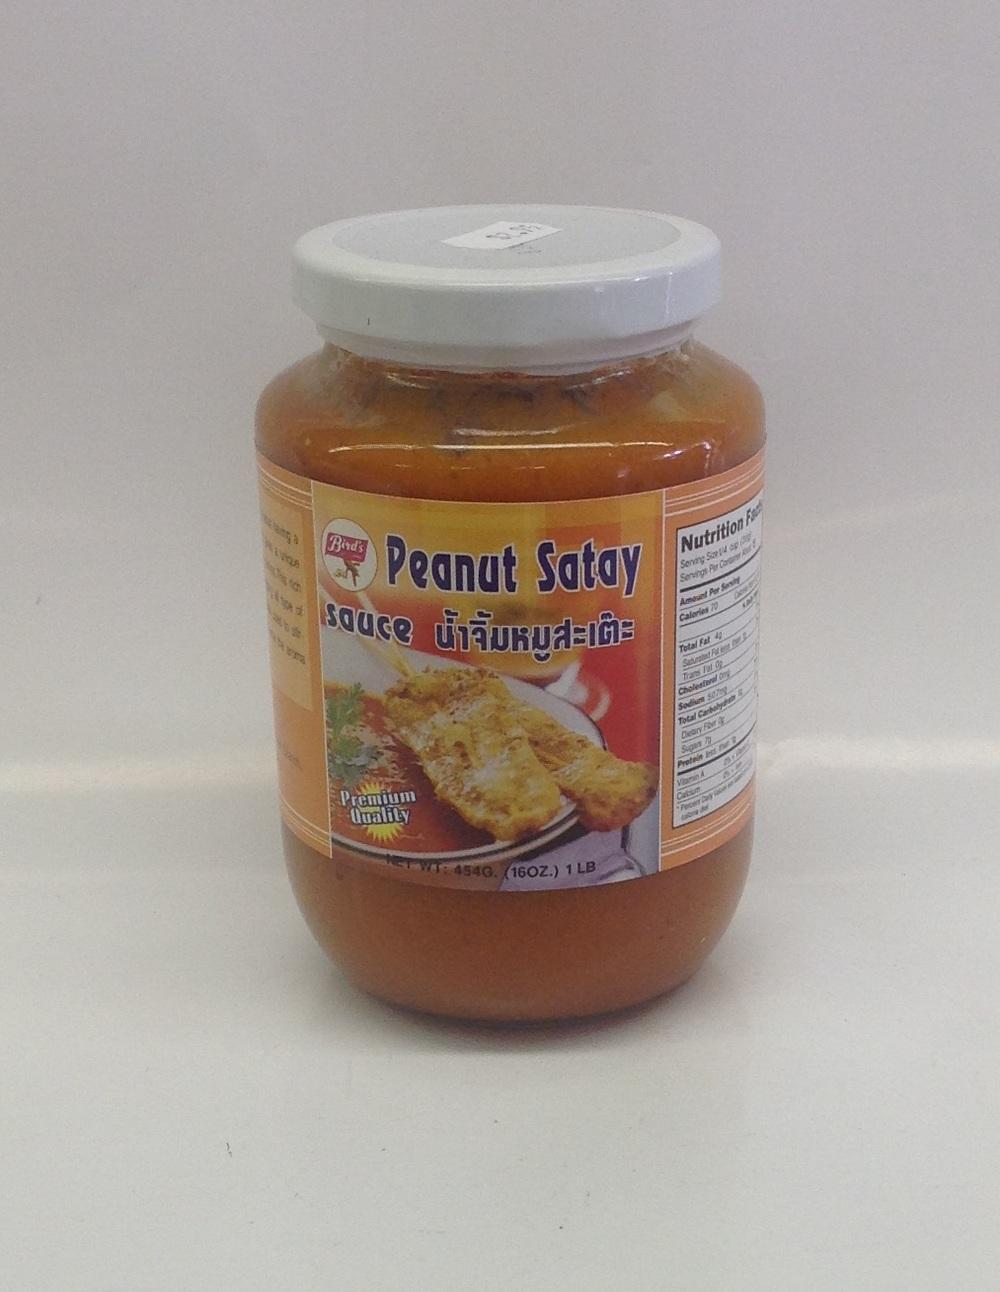 Peanut Satay Sauce   Bird's   SA17010 24x16 oz